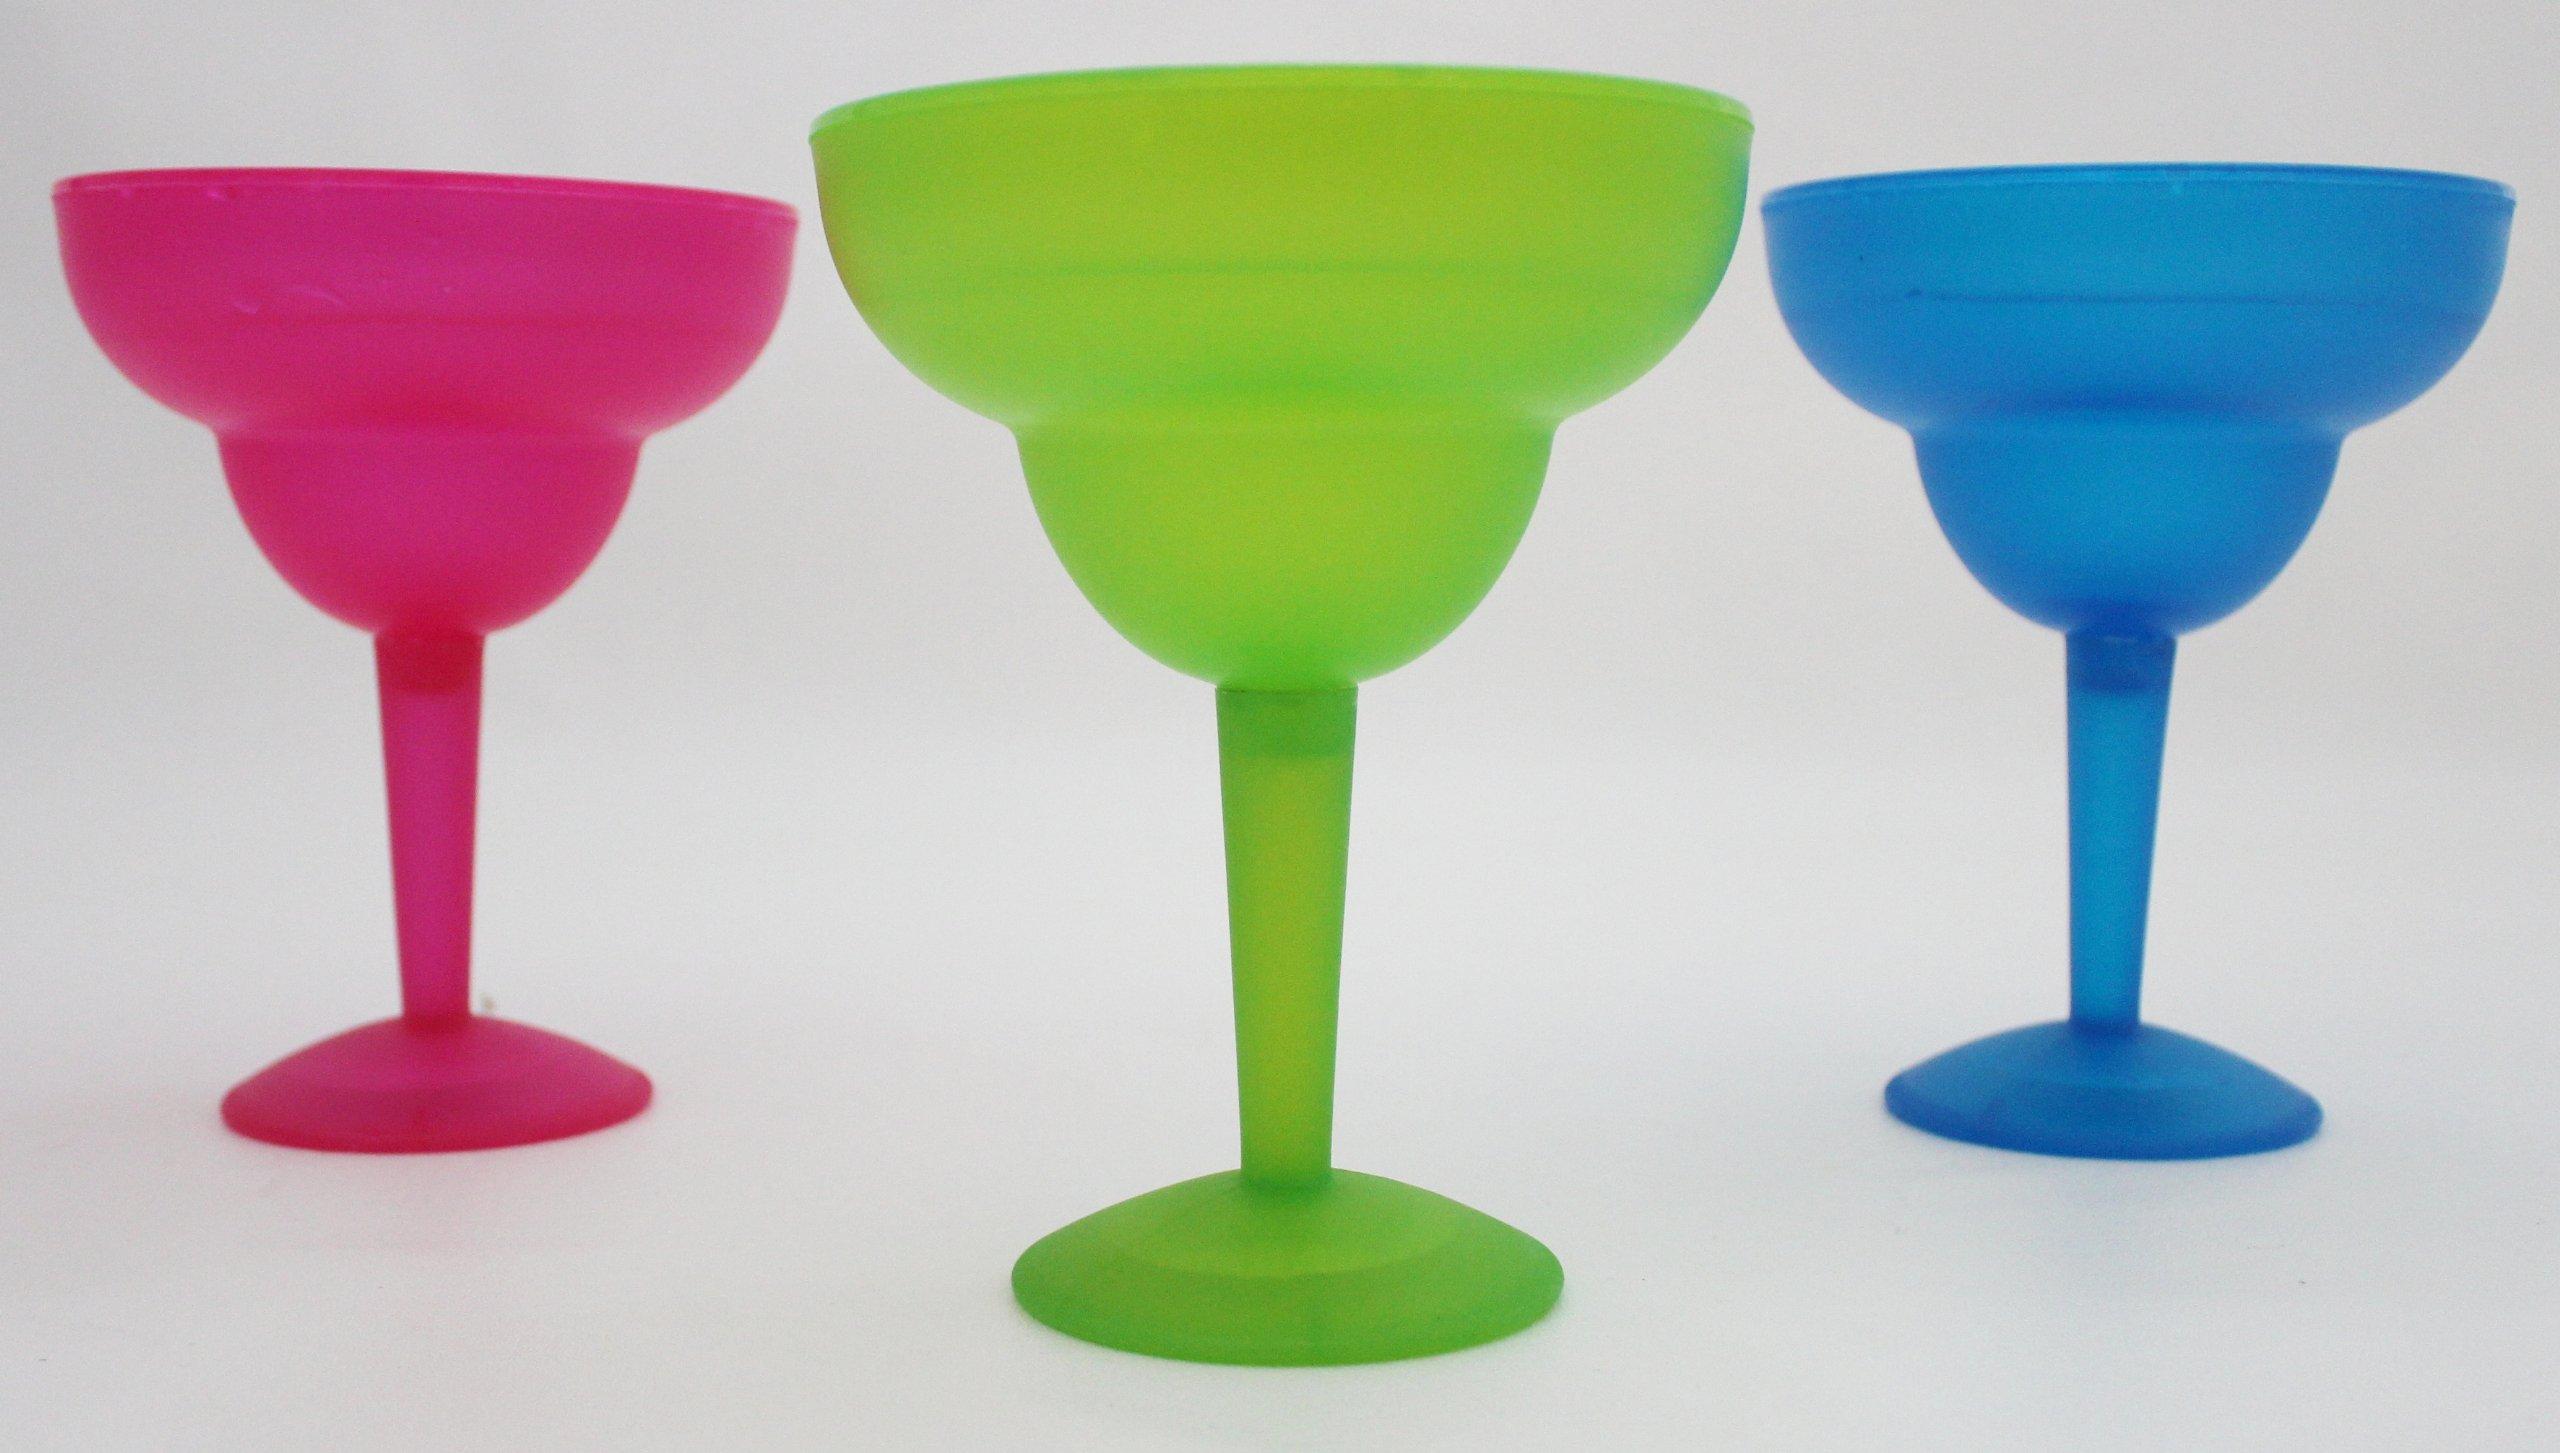 Bright Vibrant Margarita Frozen (Freezer) Glasses Set of 3 (Blue, Pink & Green)